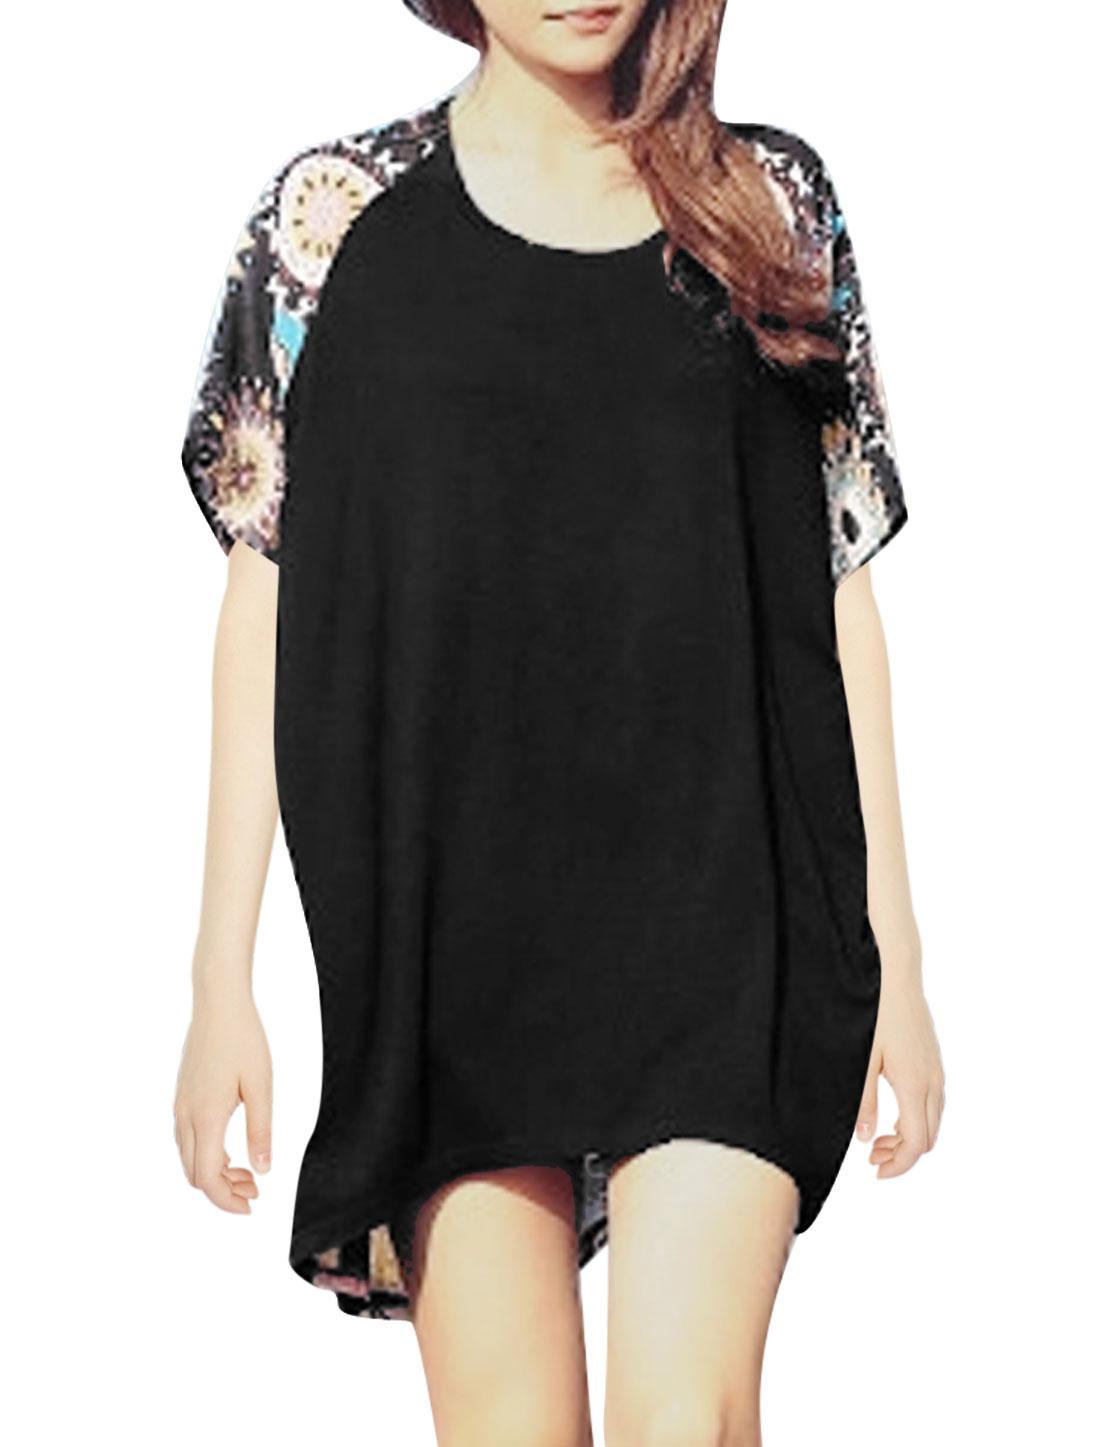 Lady Geometric Prints Low High Hem Chiffon Panel Tunic T-Shirt Black XS